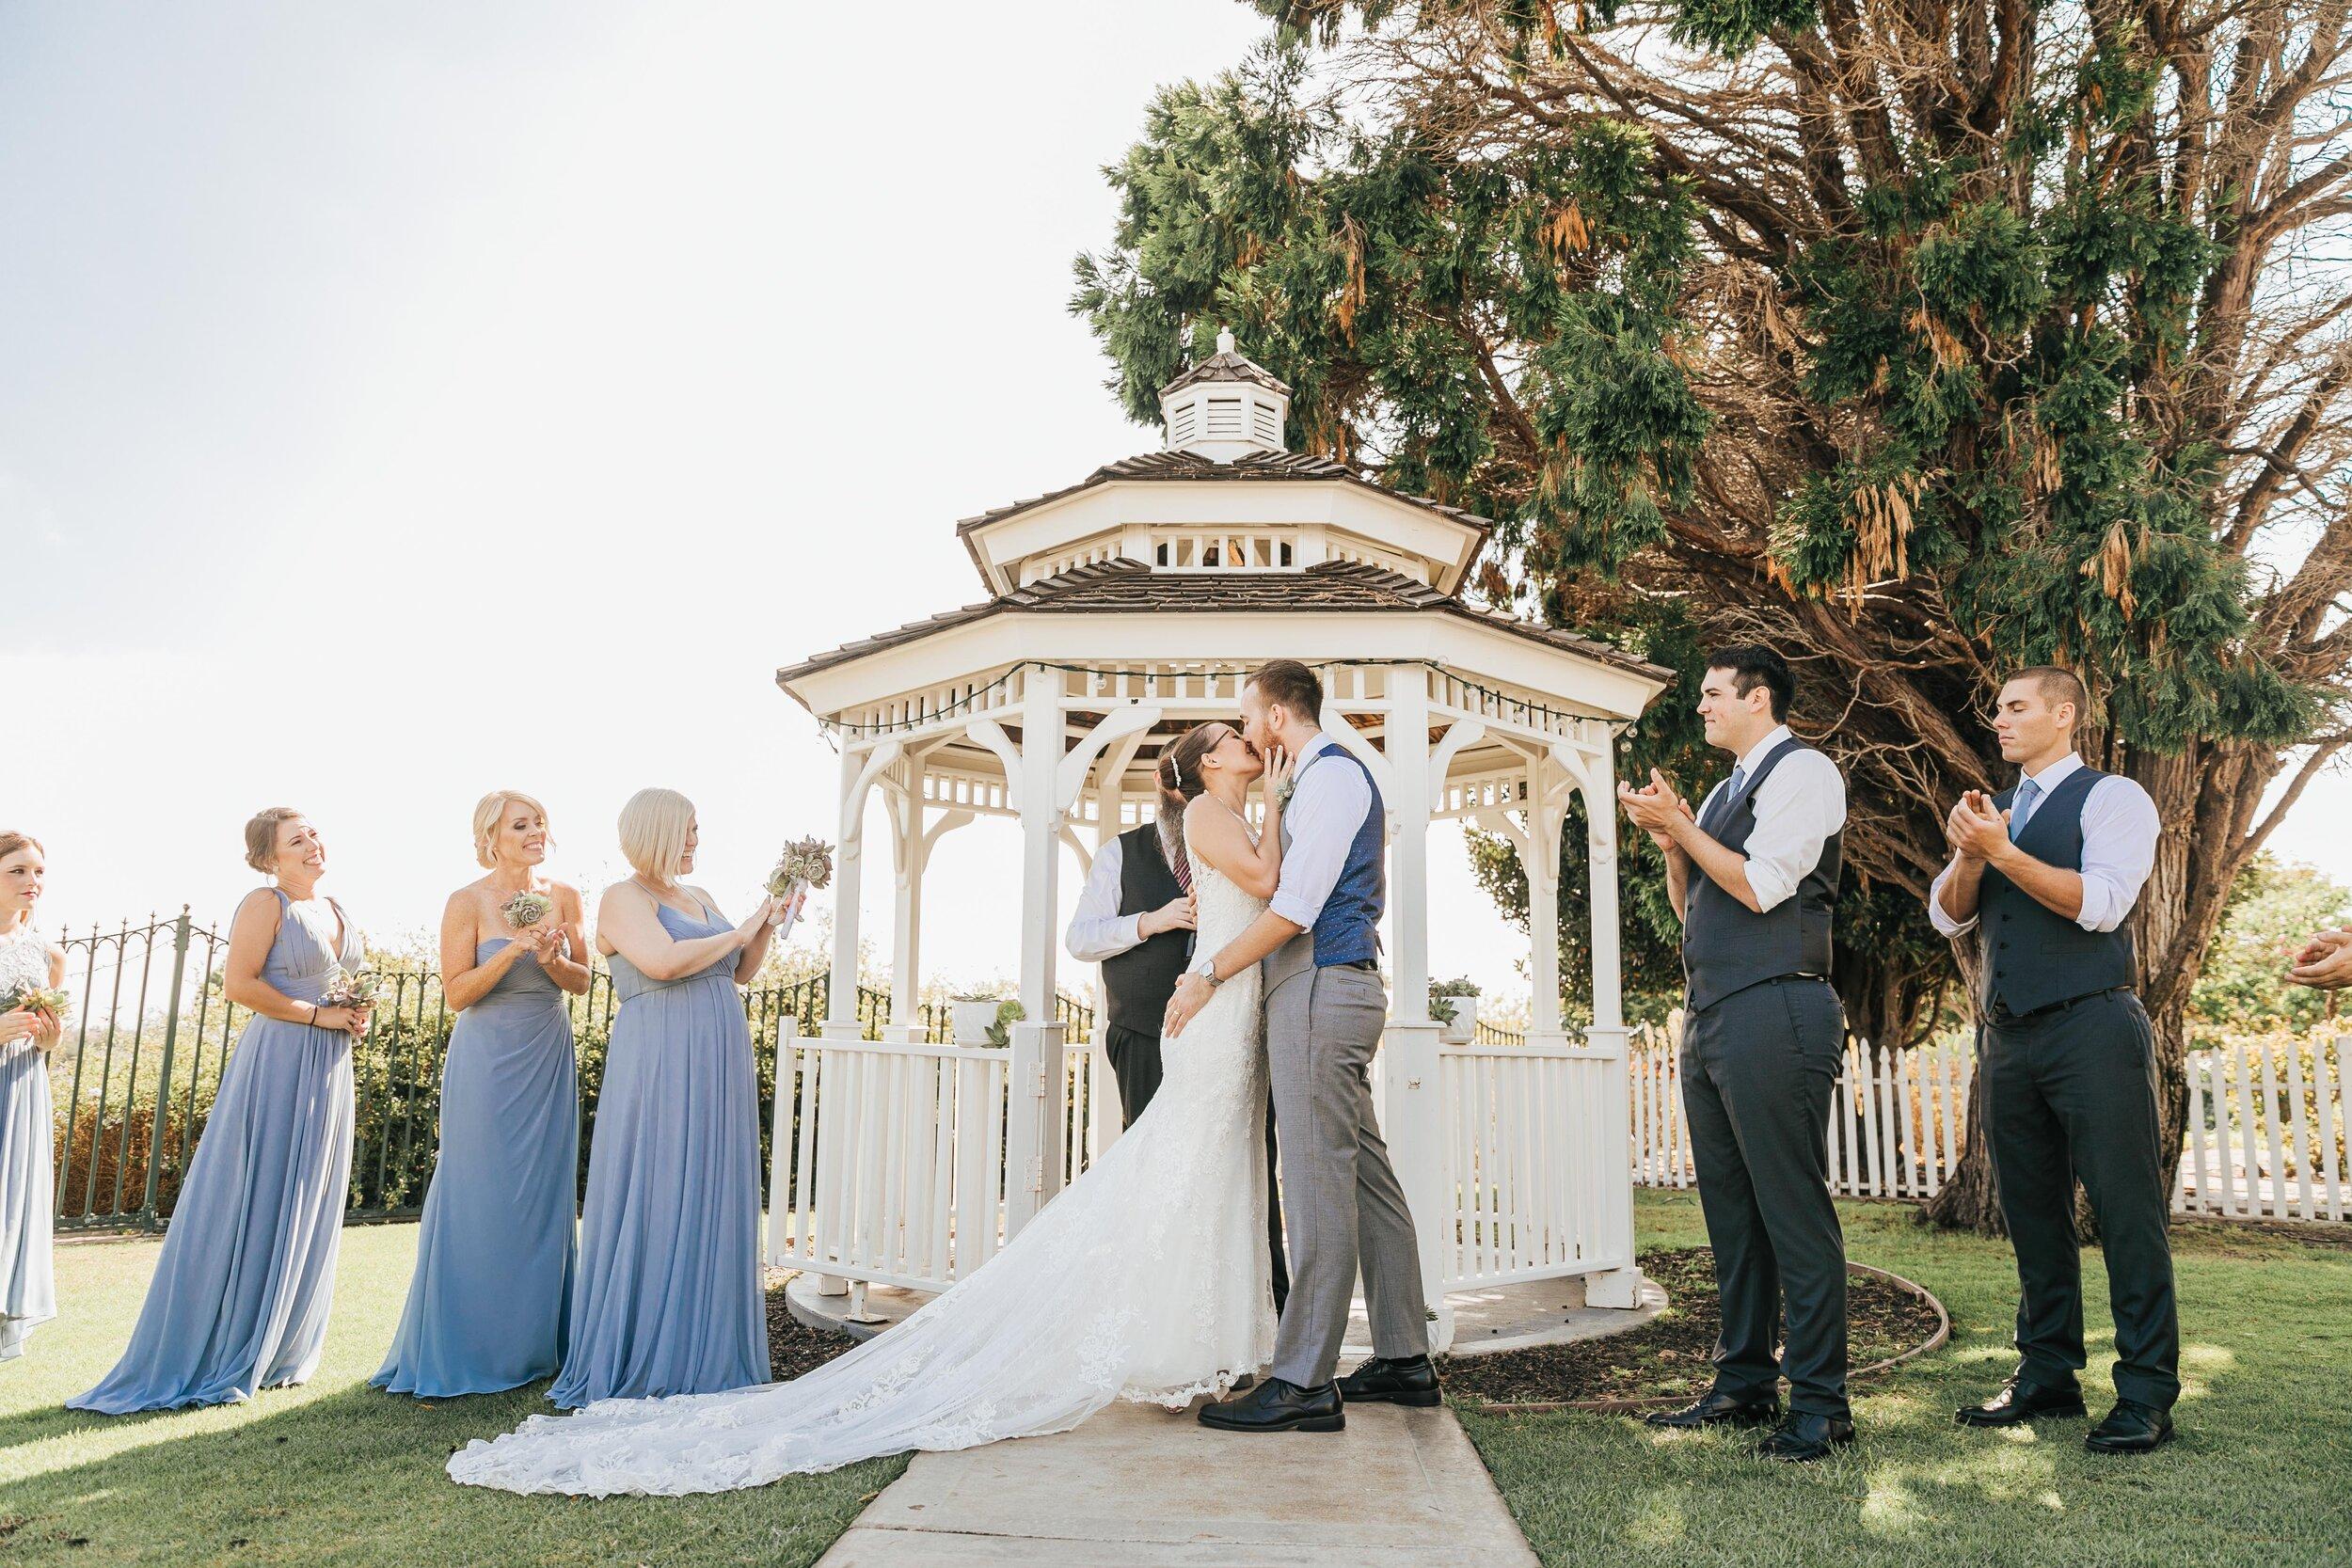 newland_barn_hungtington_beach__photoshoot_joshuachun_wedding-0437.jpg